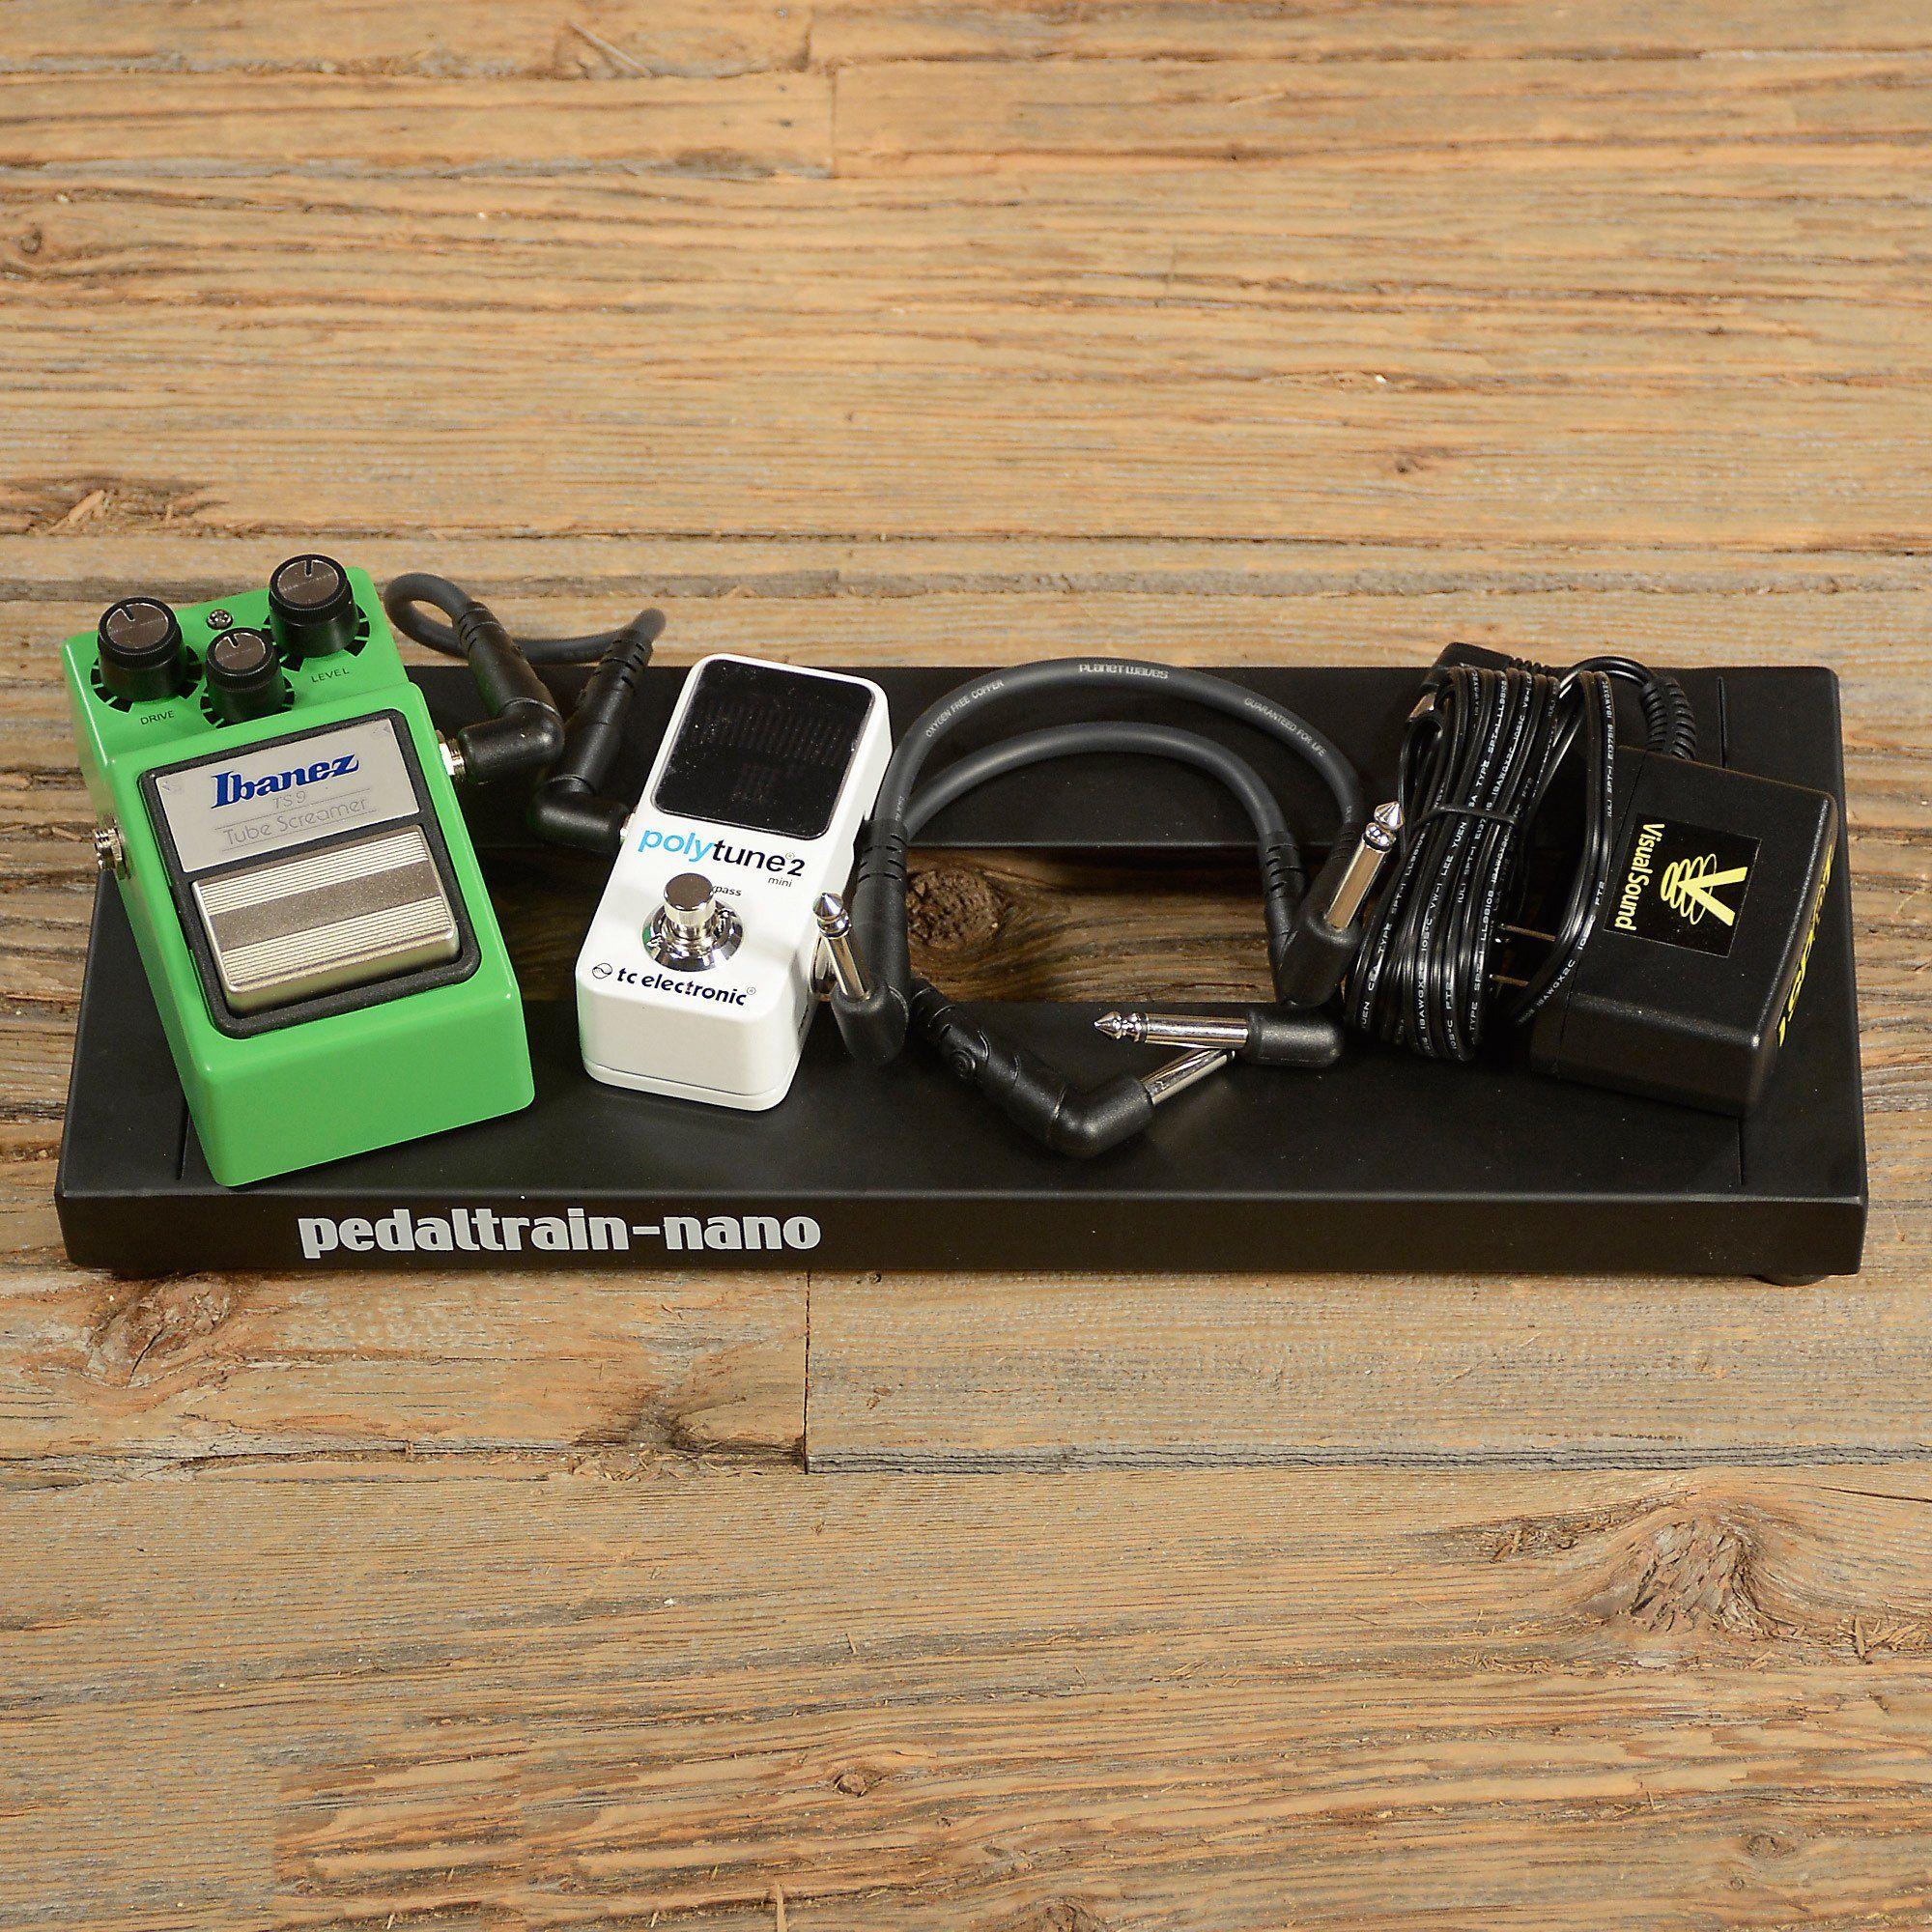 Ibanez TS9 Tube Screamer Pedalboard Bundle w/Polytune Mini 2